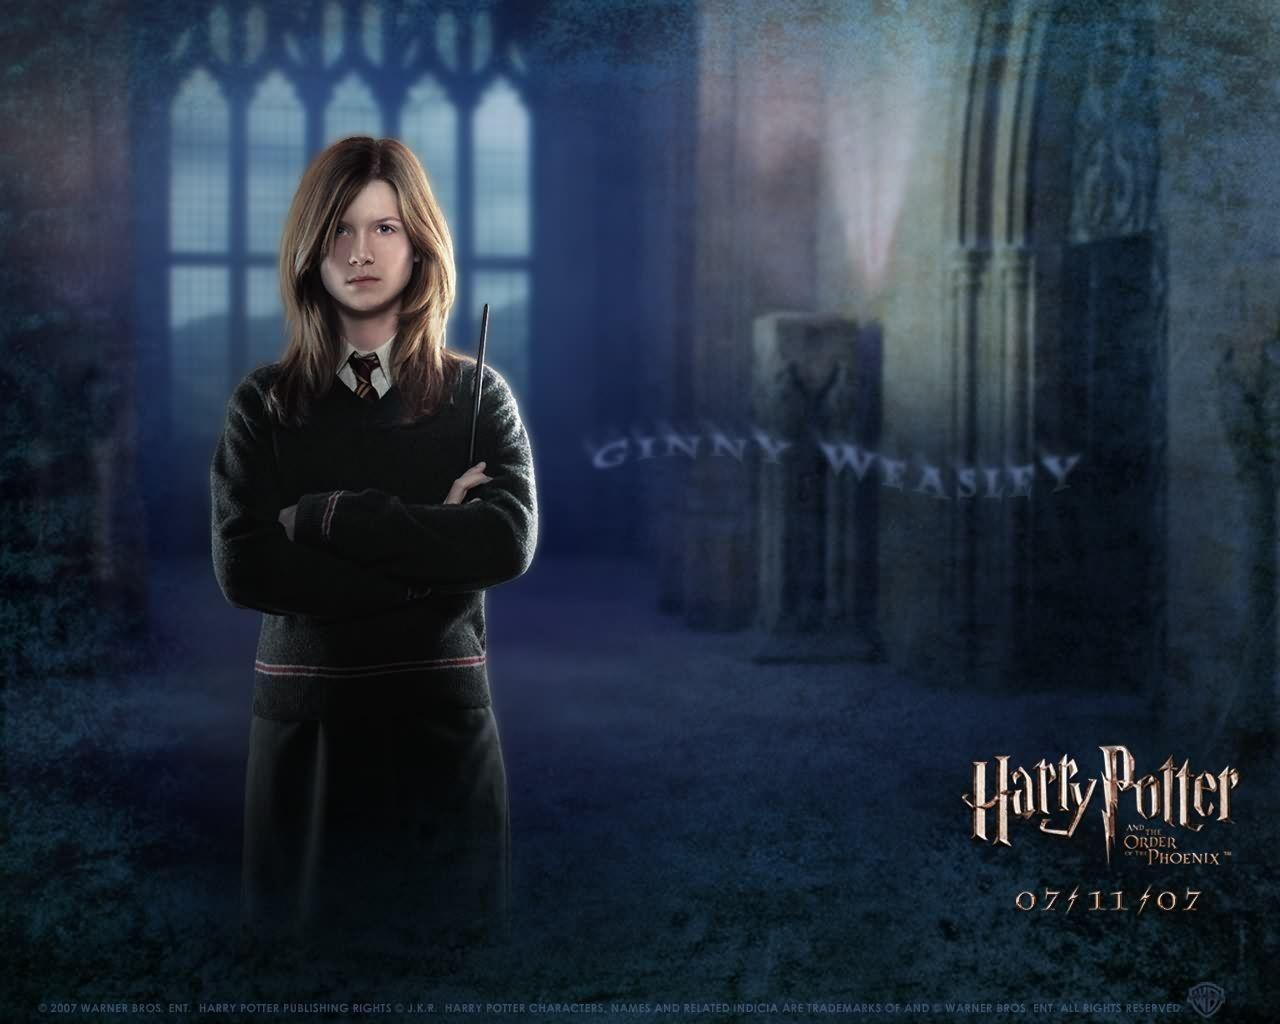 Best Wallpaper Harry Potter Blue - ginny-weasly-your-favorite-harry-potter-cuples-8905081-1280-1024  Trends_738334.jpg